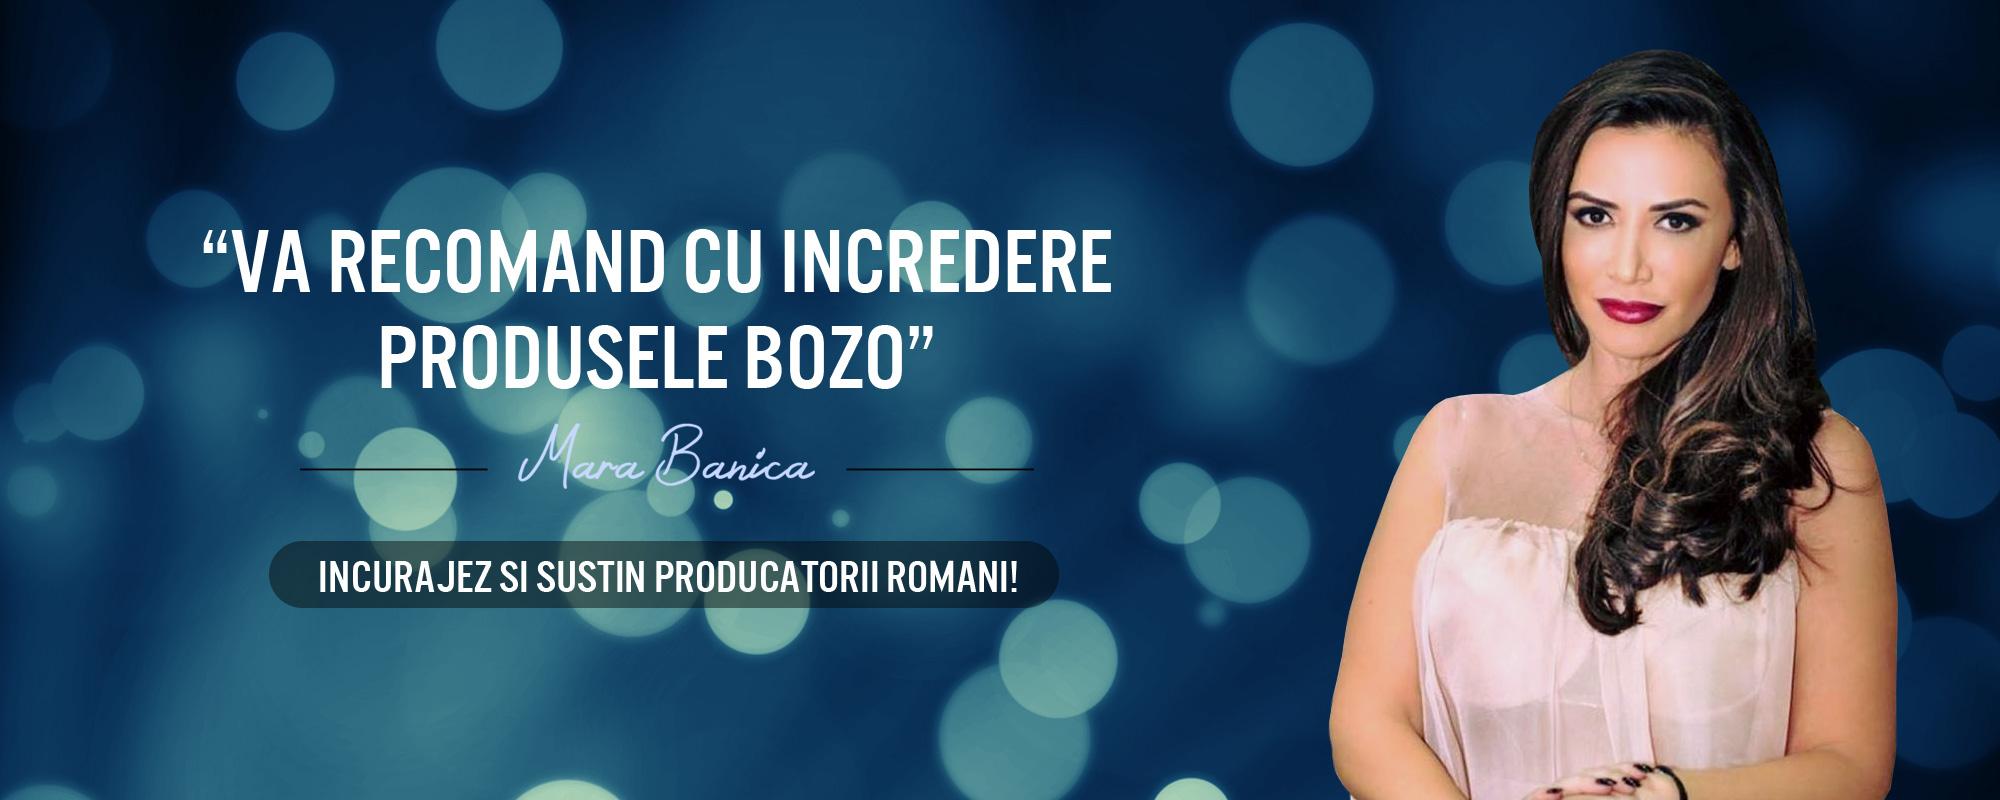 Bozo Air Fresh - Mara Banica Va recomand cu incredere produsele Bozo